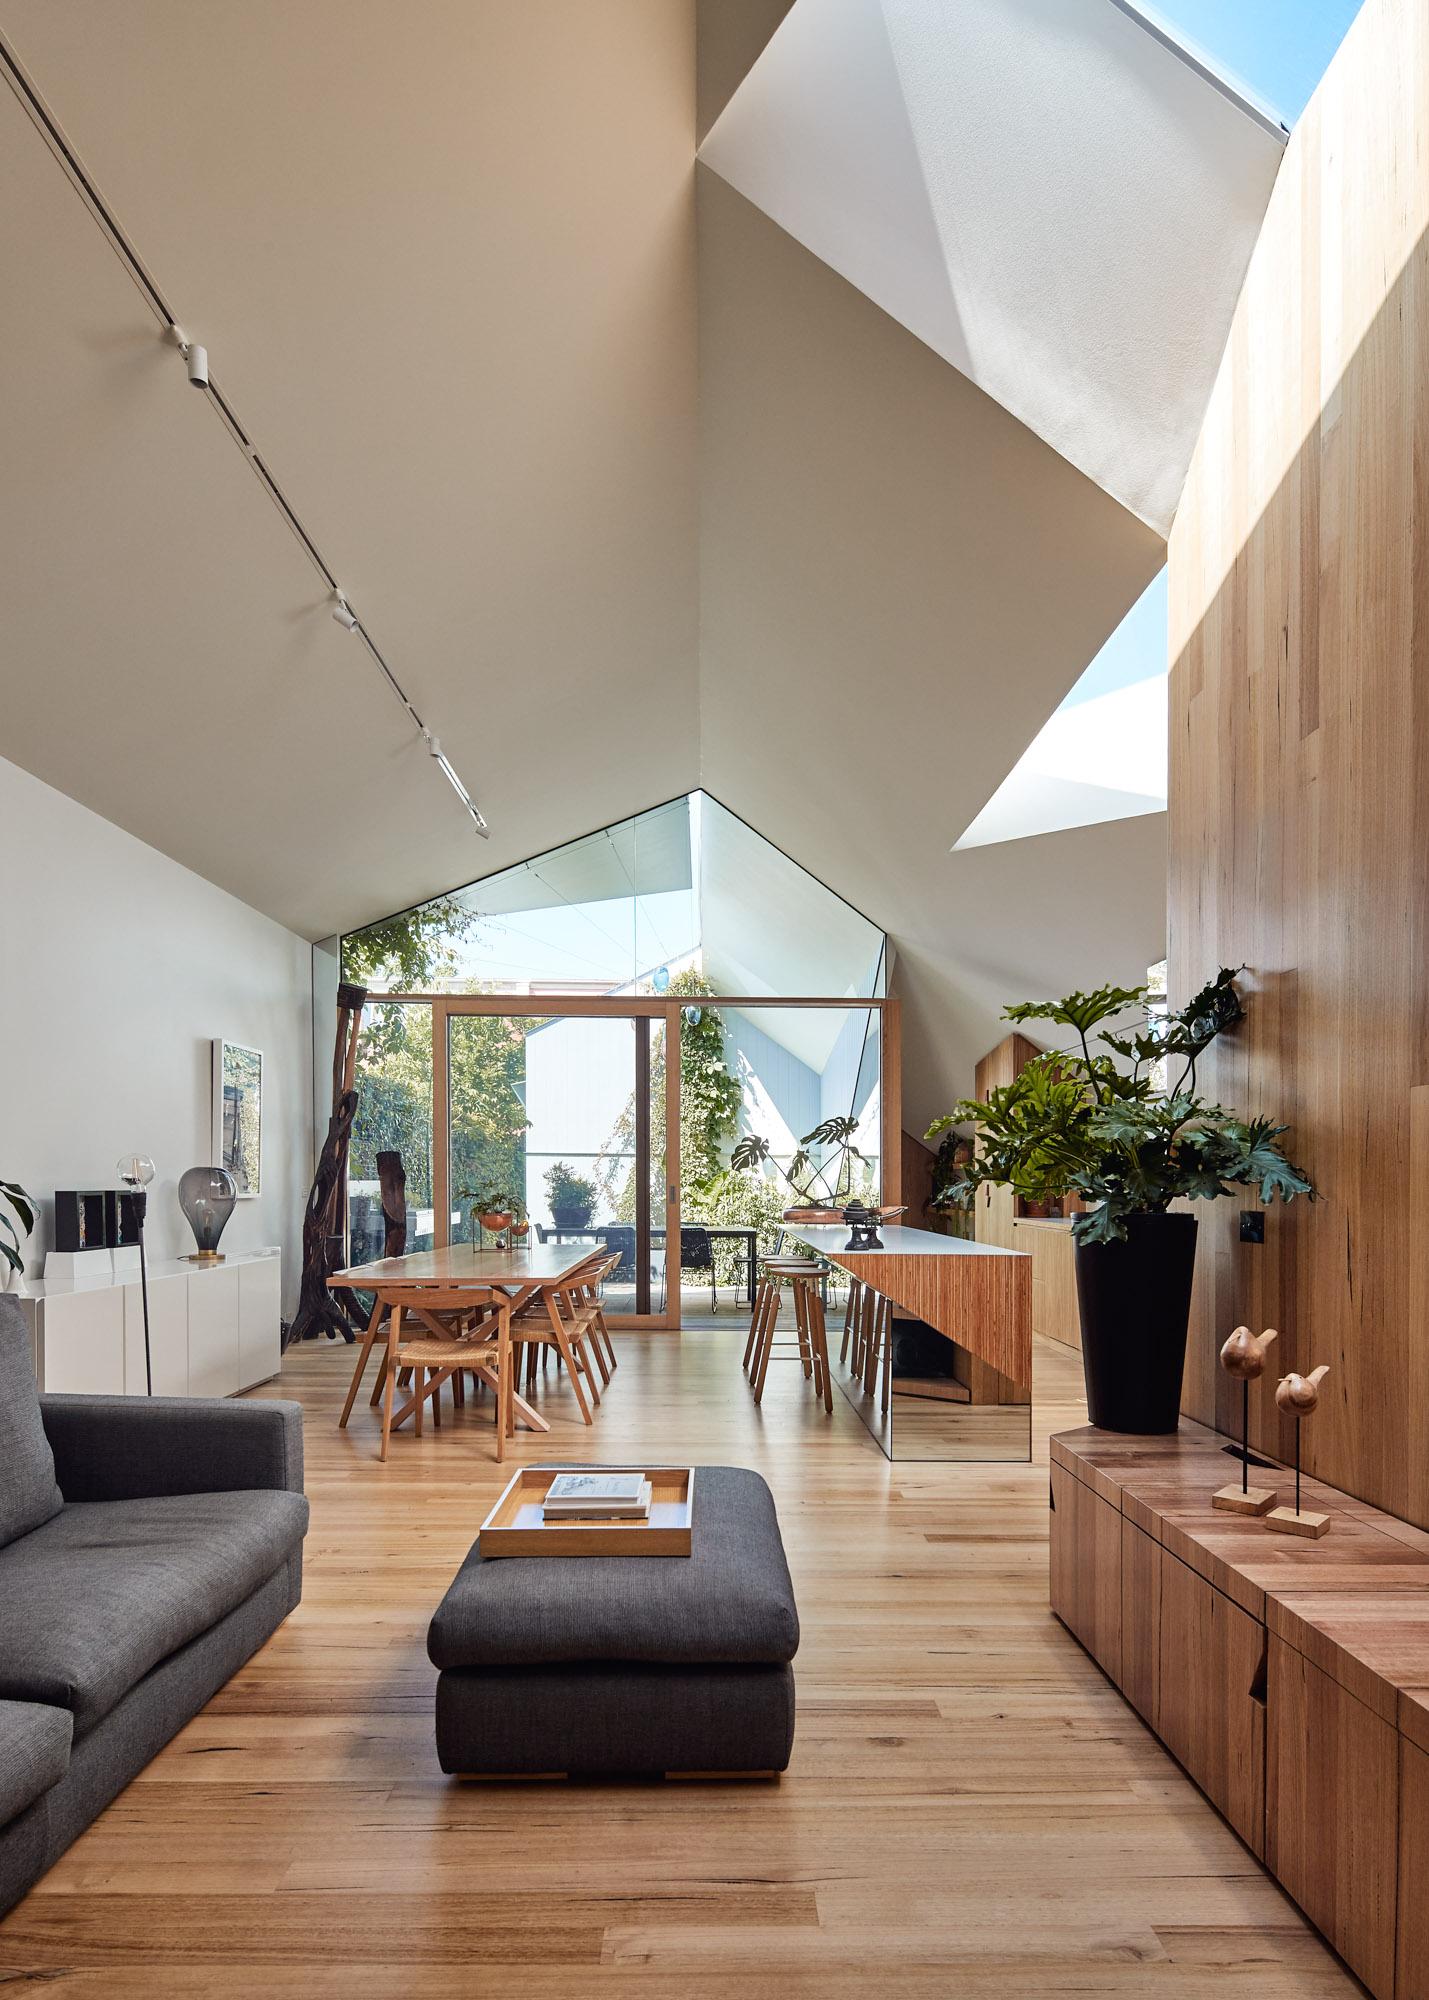 His & Hers House-2.jpg